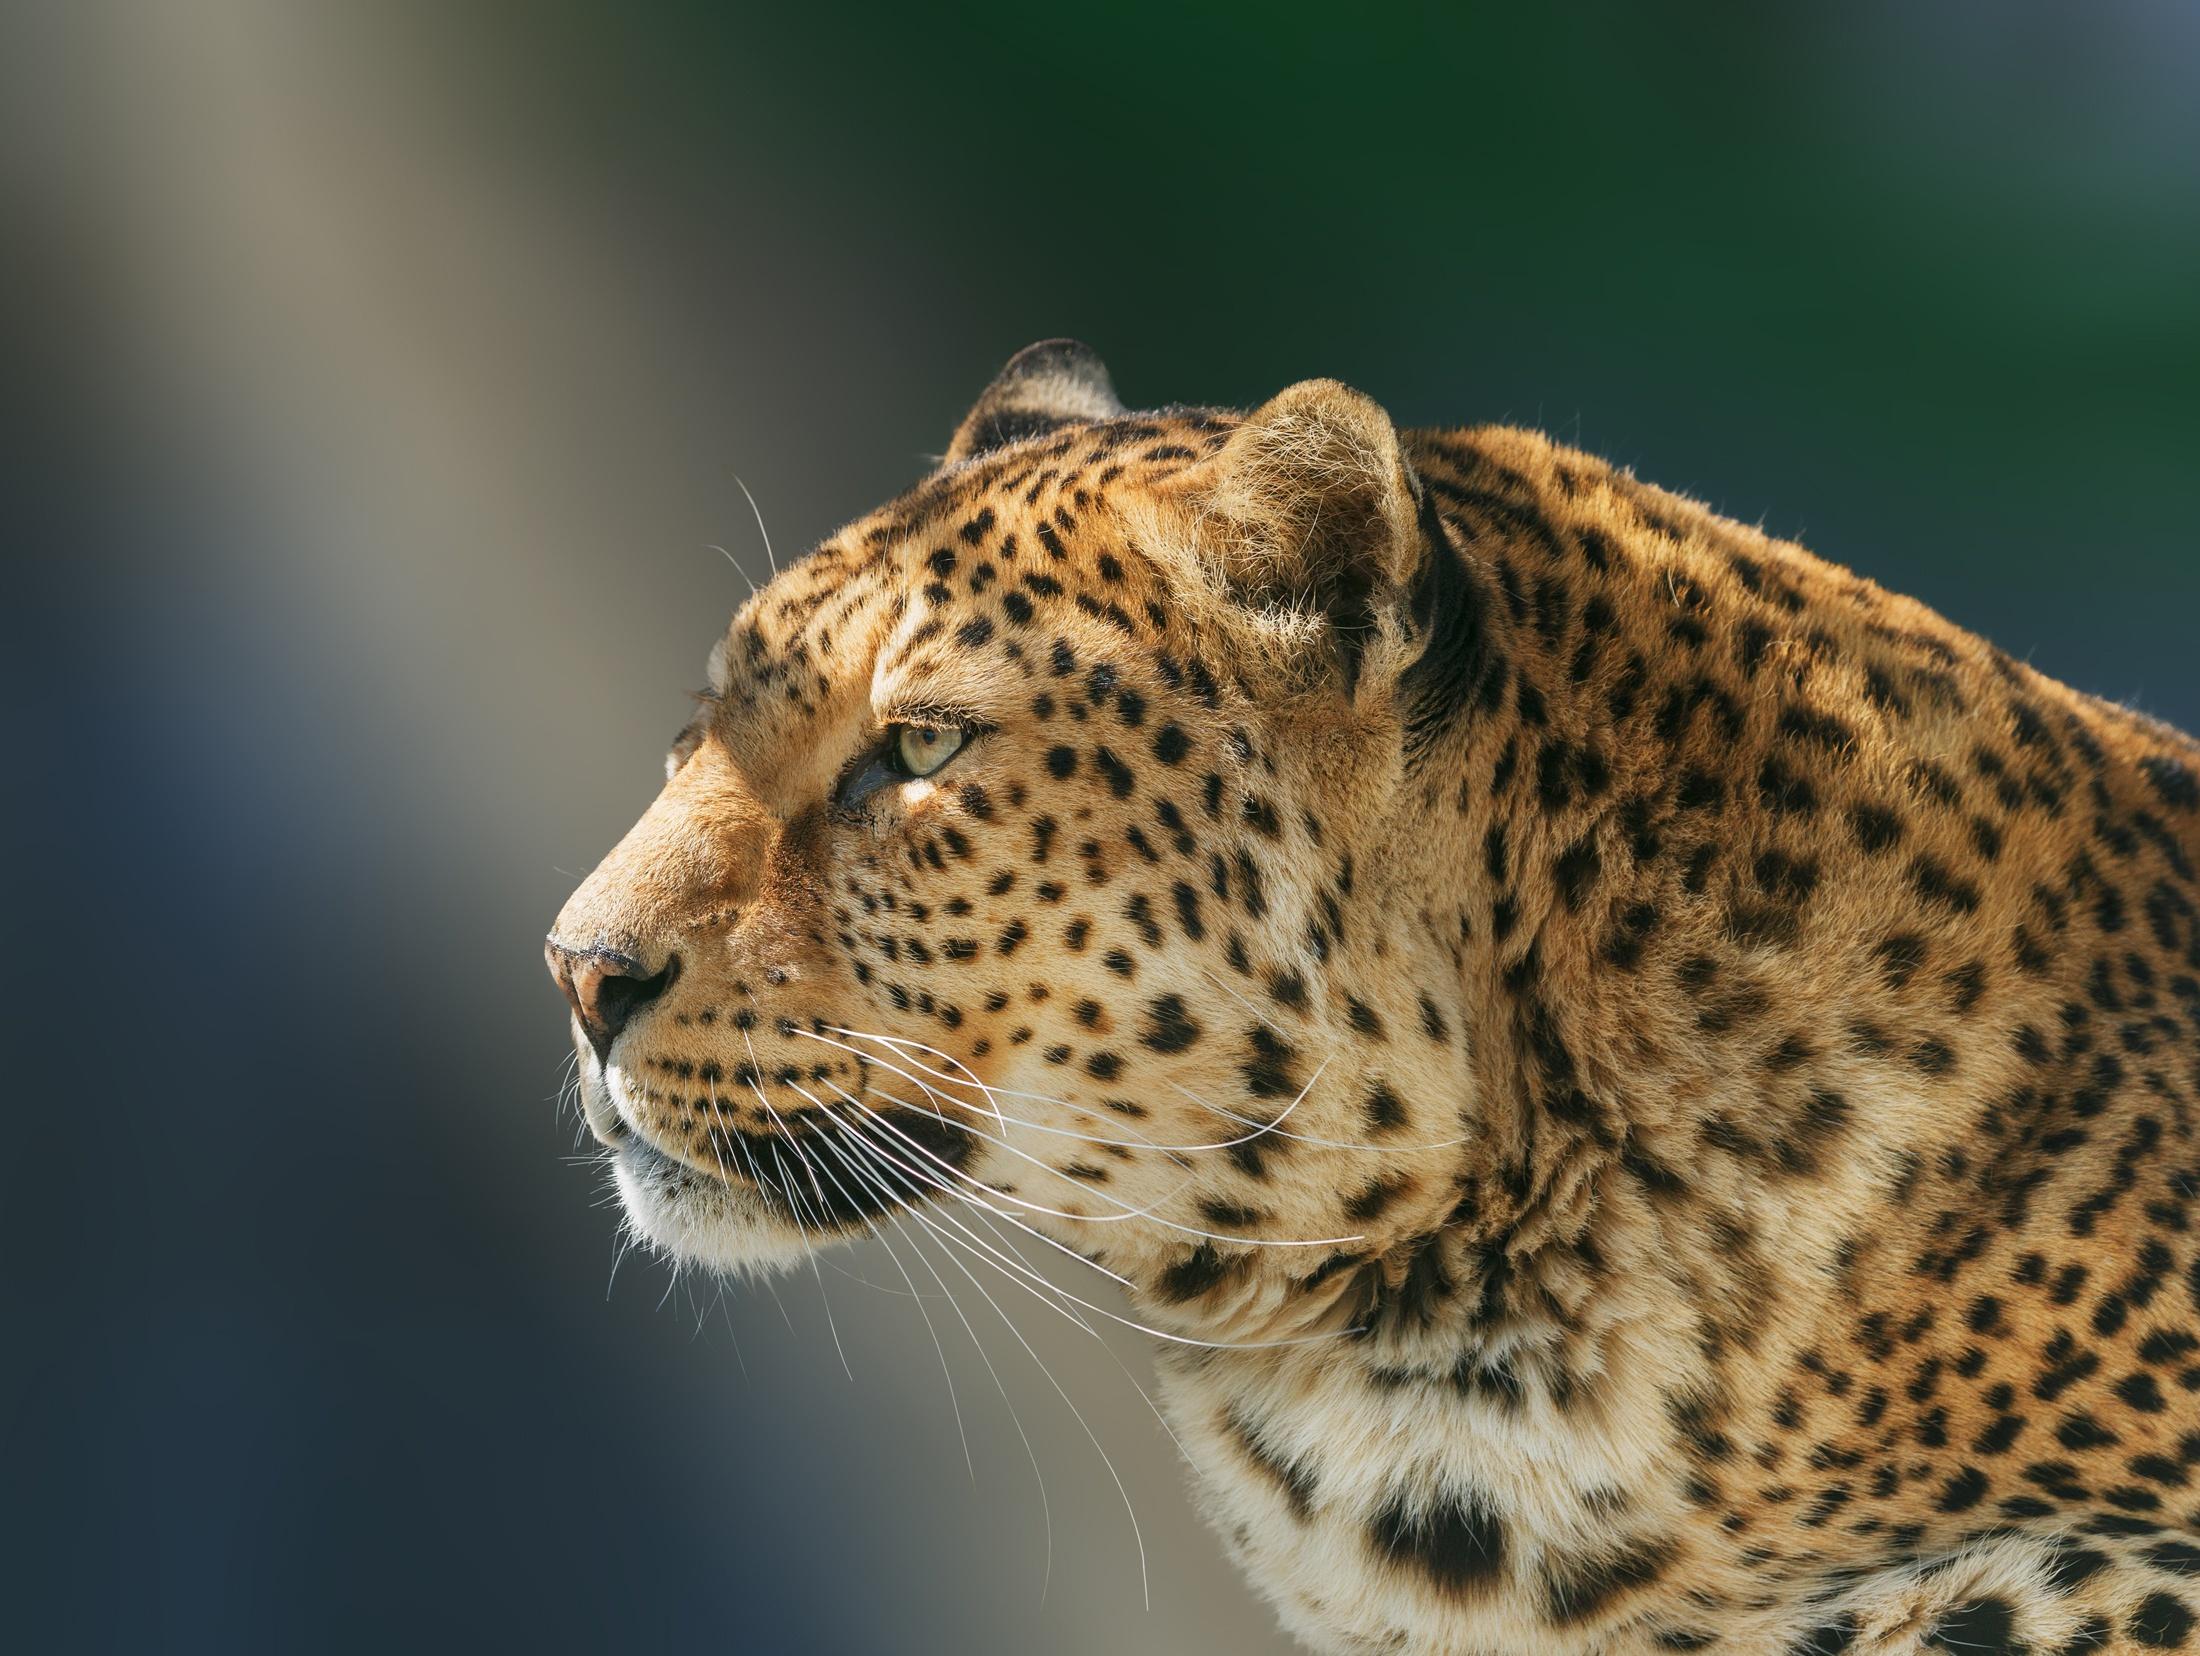 Wallpaper Cheetah Pair Hd Animals 6057: 1920x1080 Leopard Wild Animal Laptop Full HD 1080P HD 4k